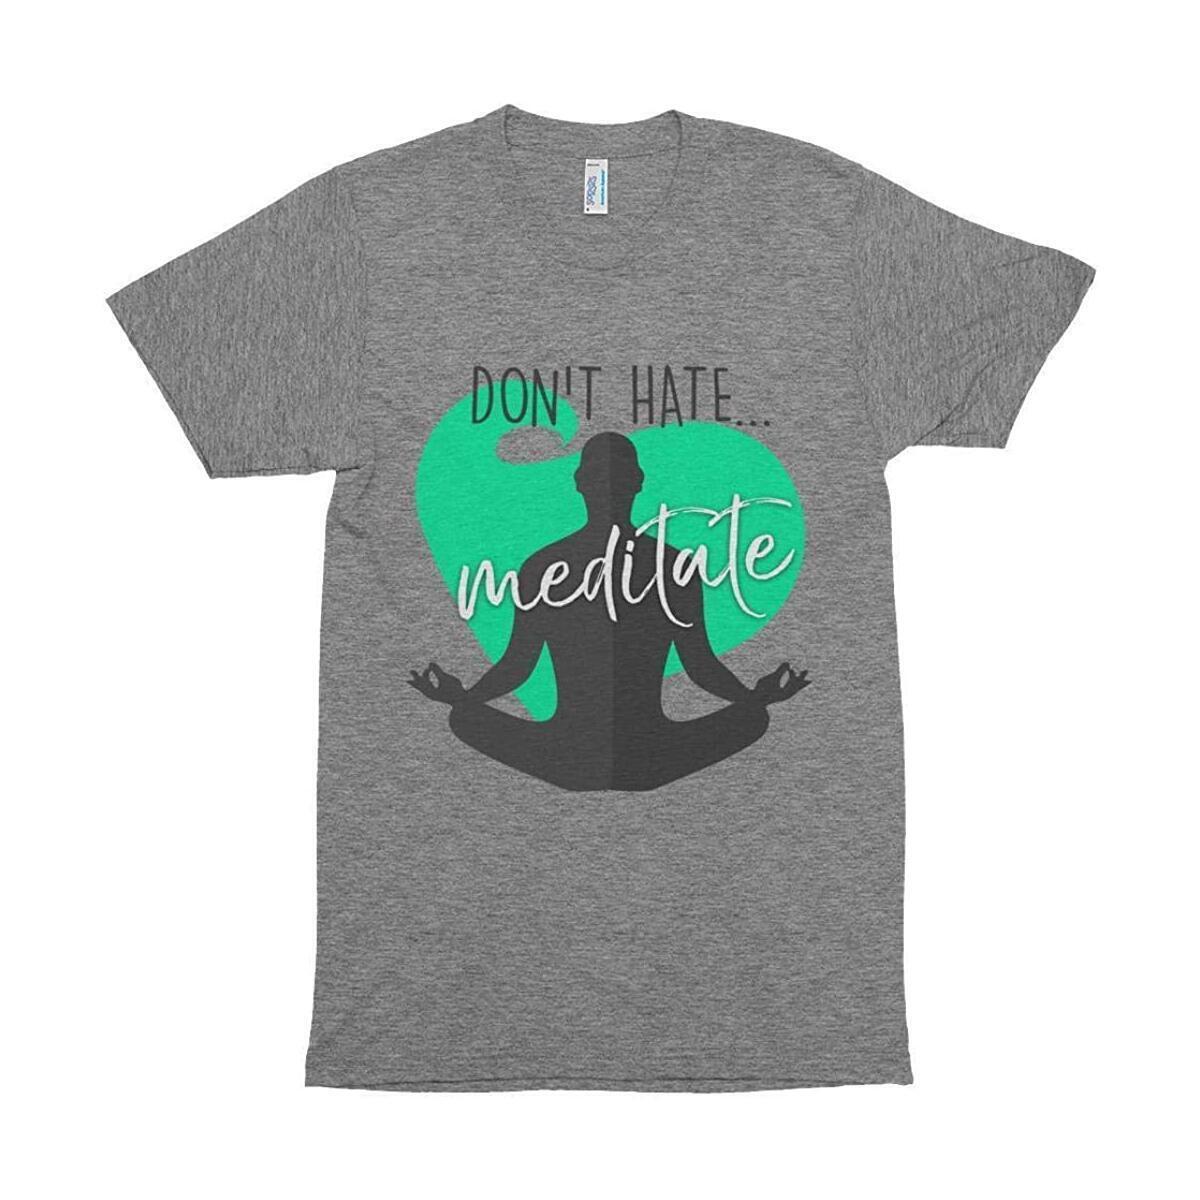 Don't Hate Meditate Shirt Yoga Zen Buddhist Zen AF Let That Shit Go- Yoga Shirt